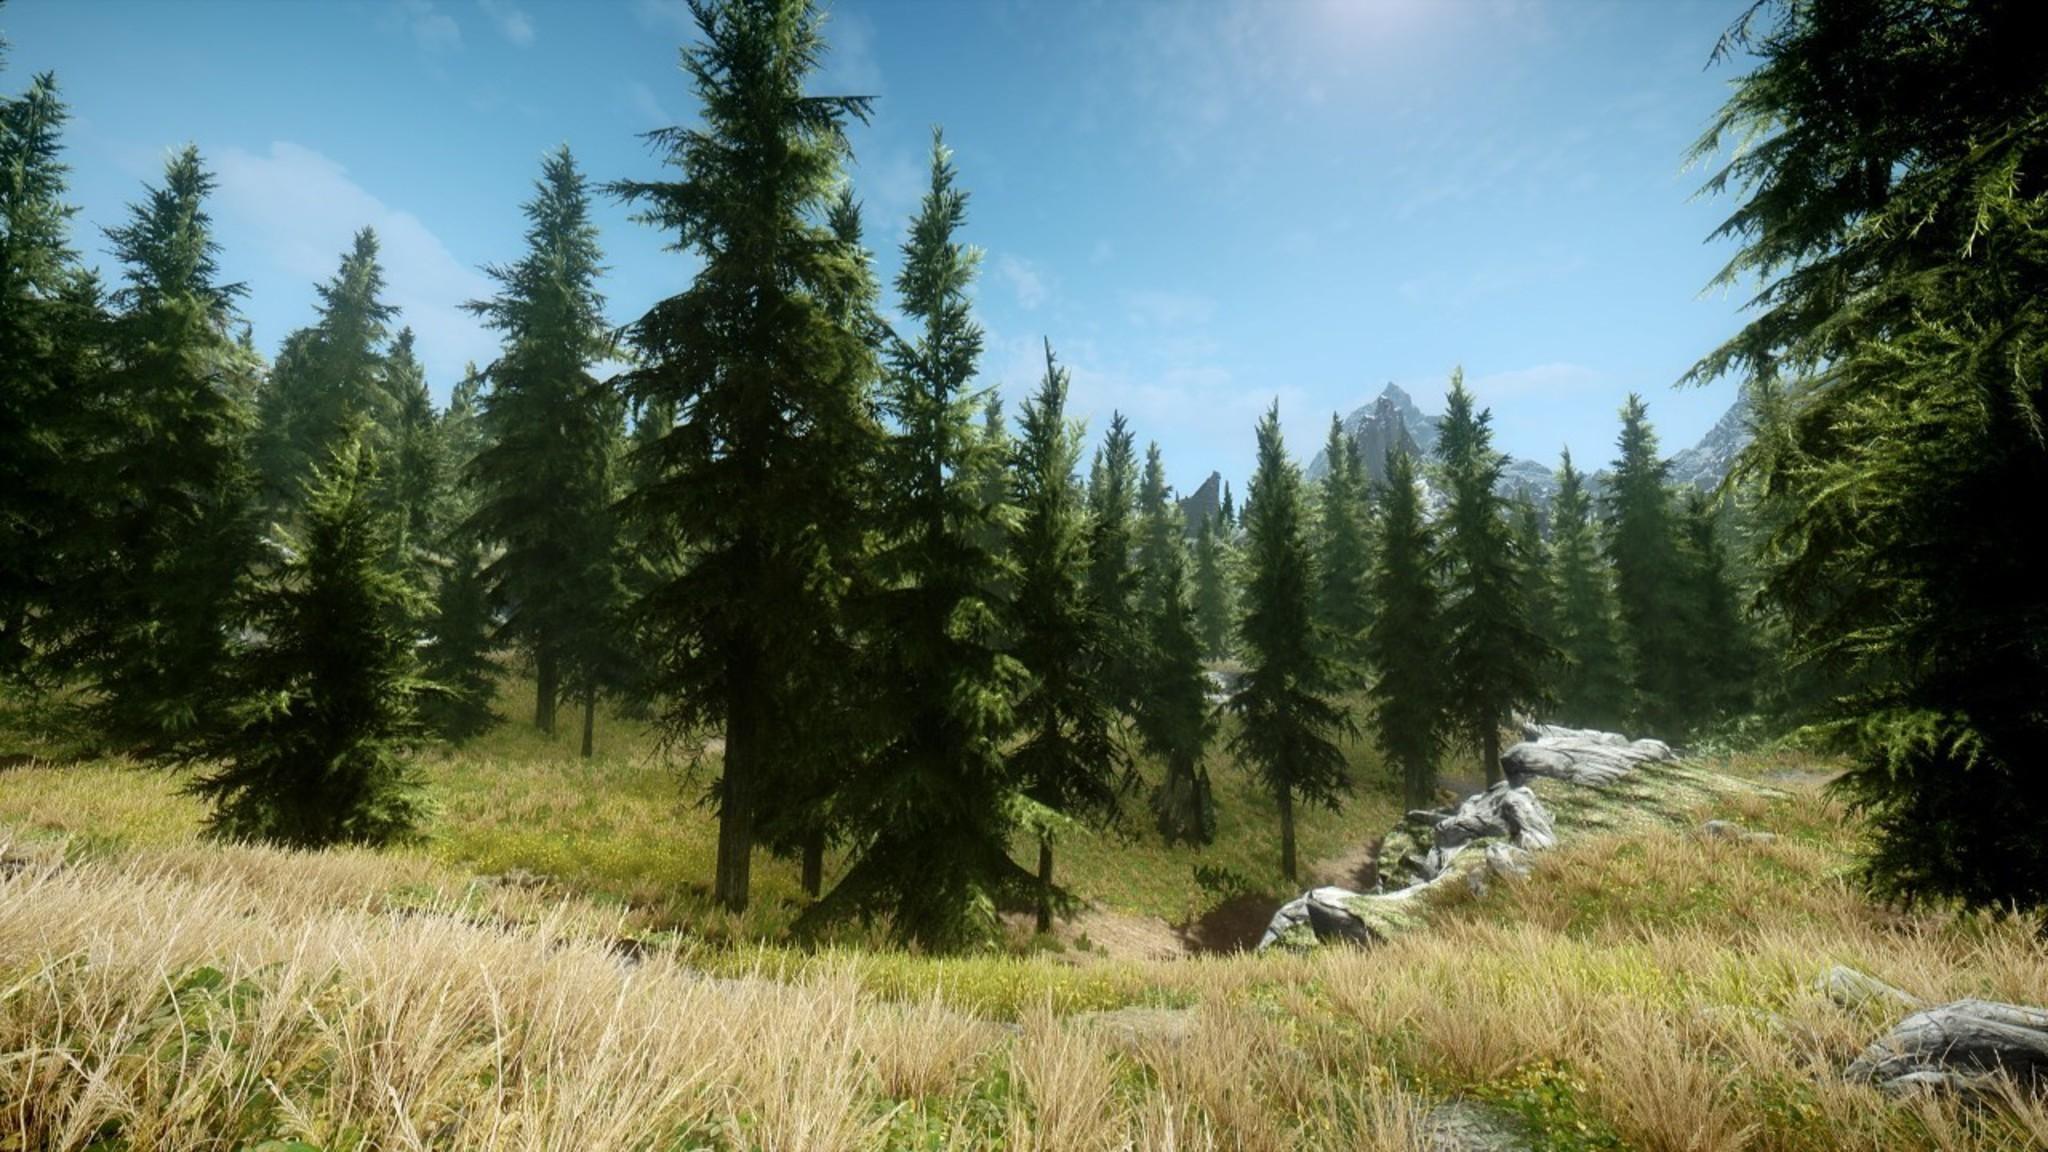 V: skyrim grass nature trees video games wallpaper .